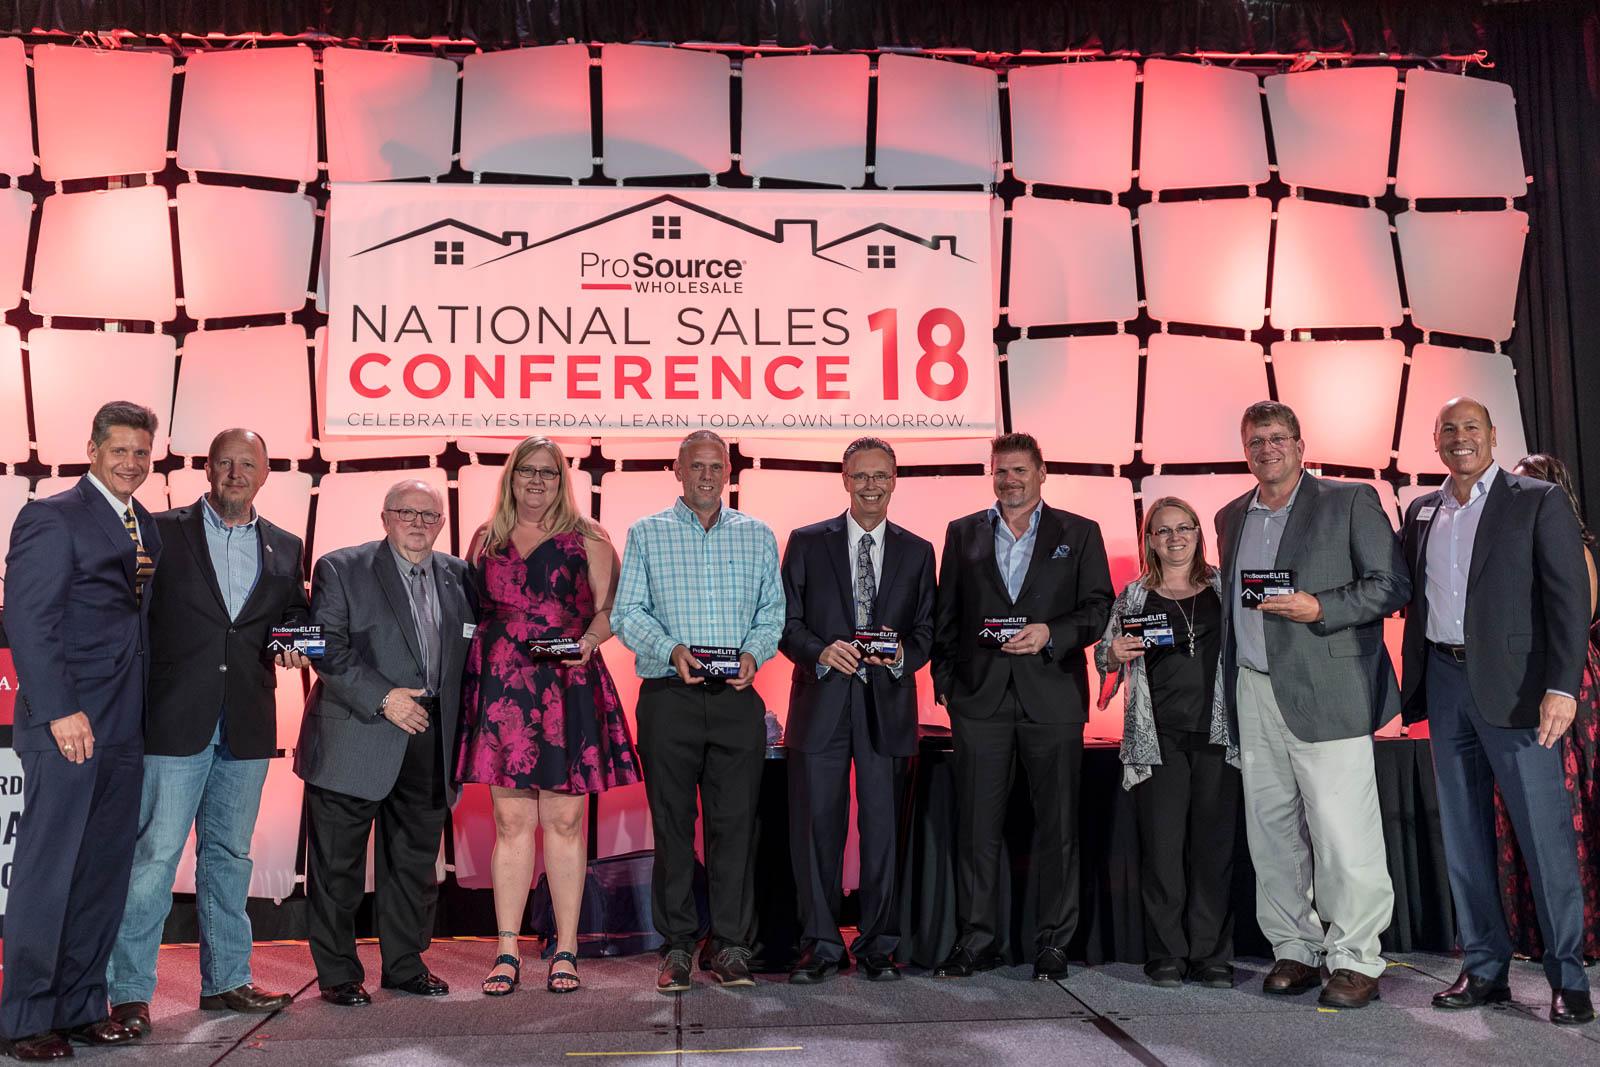 2018 ProSource National Sales Conference AV St. Charles